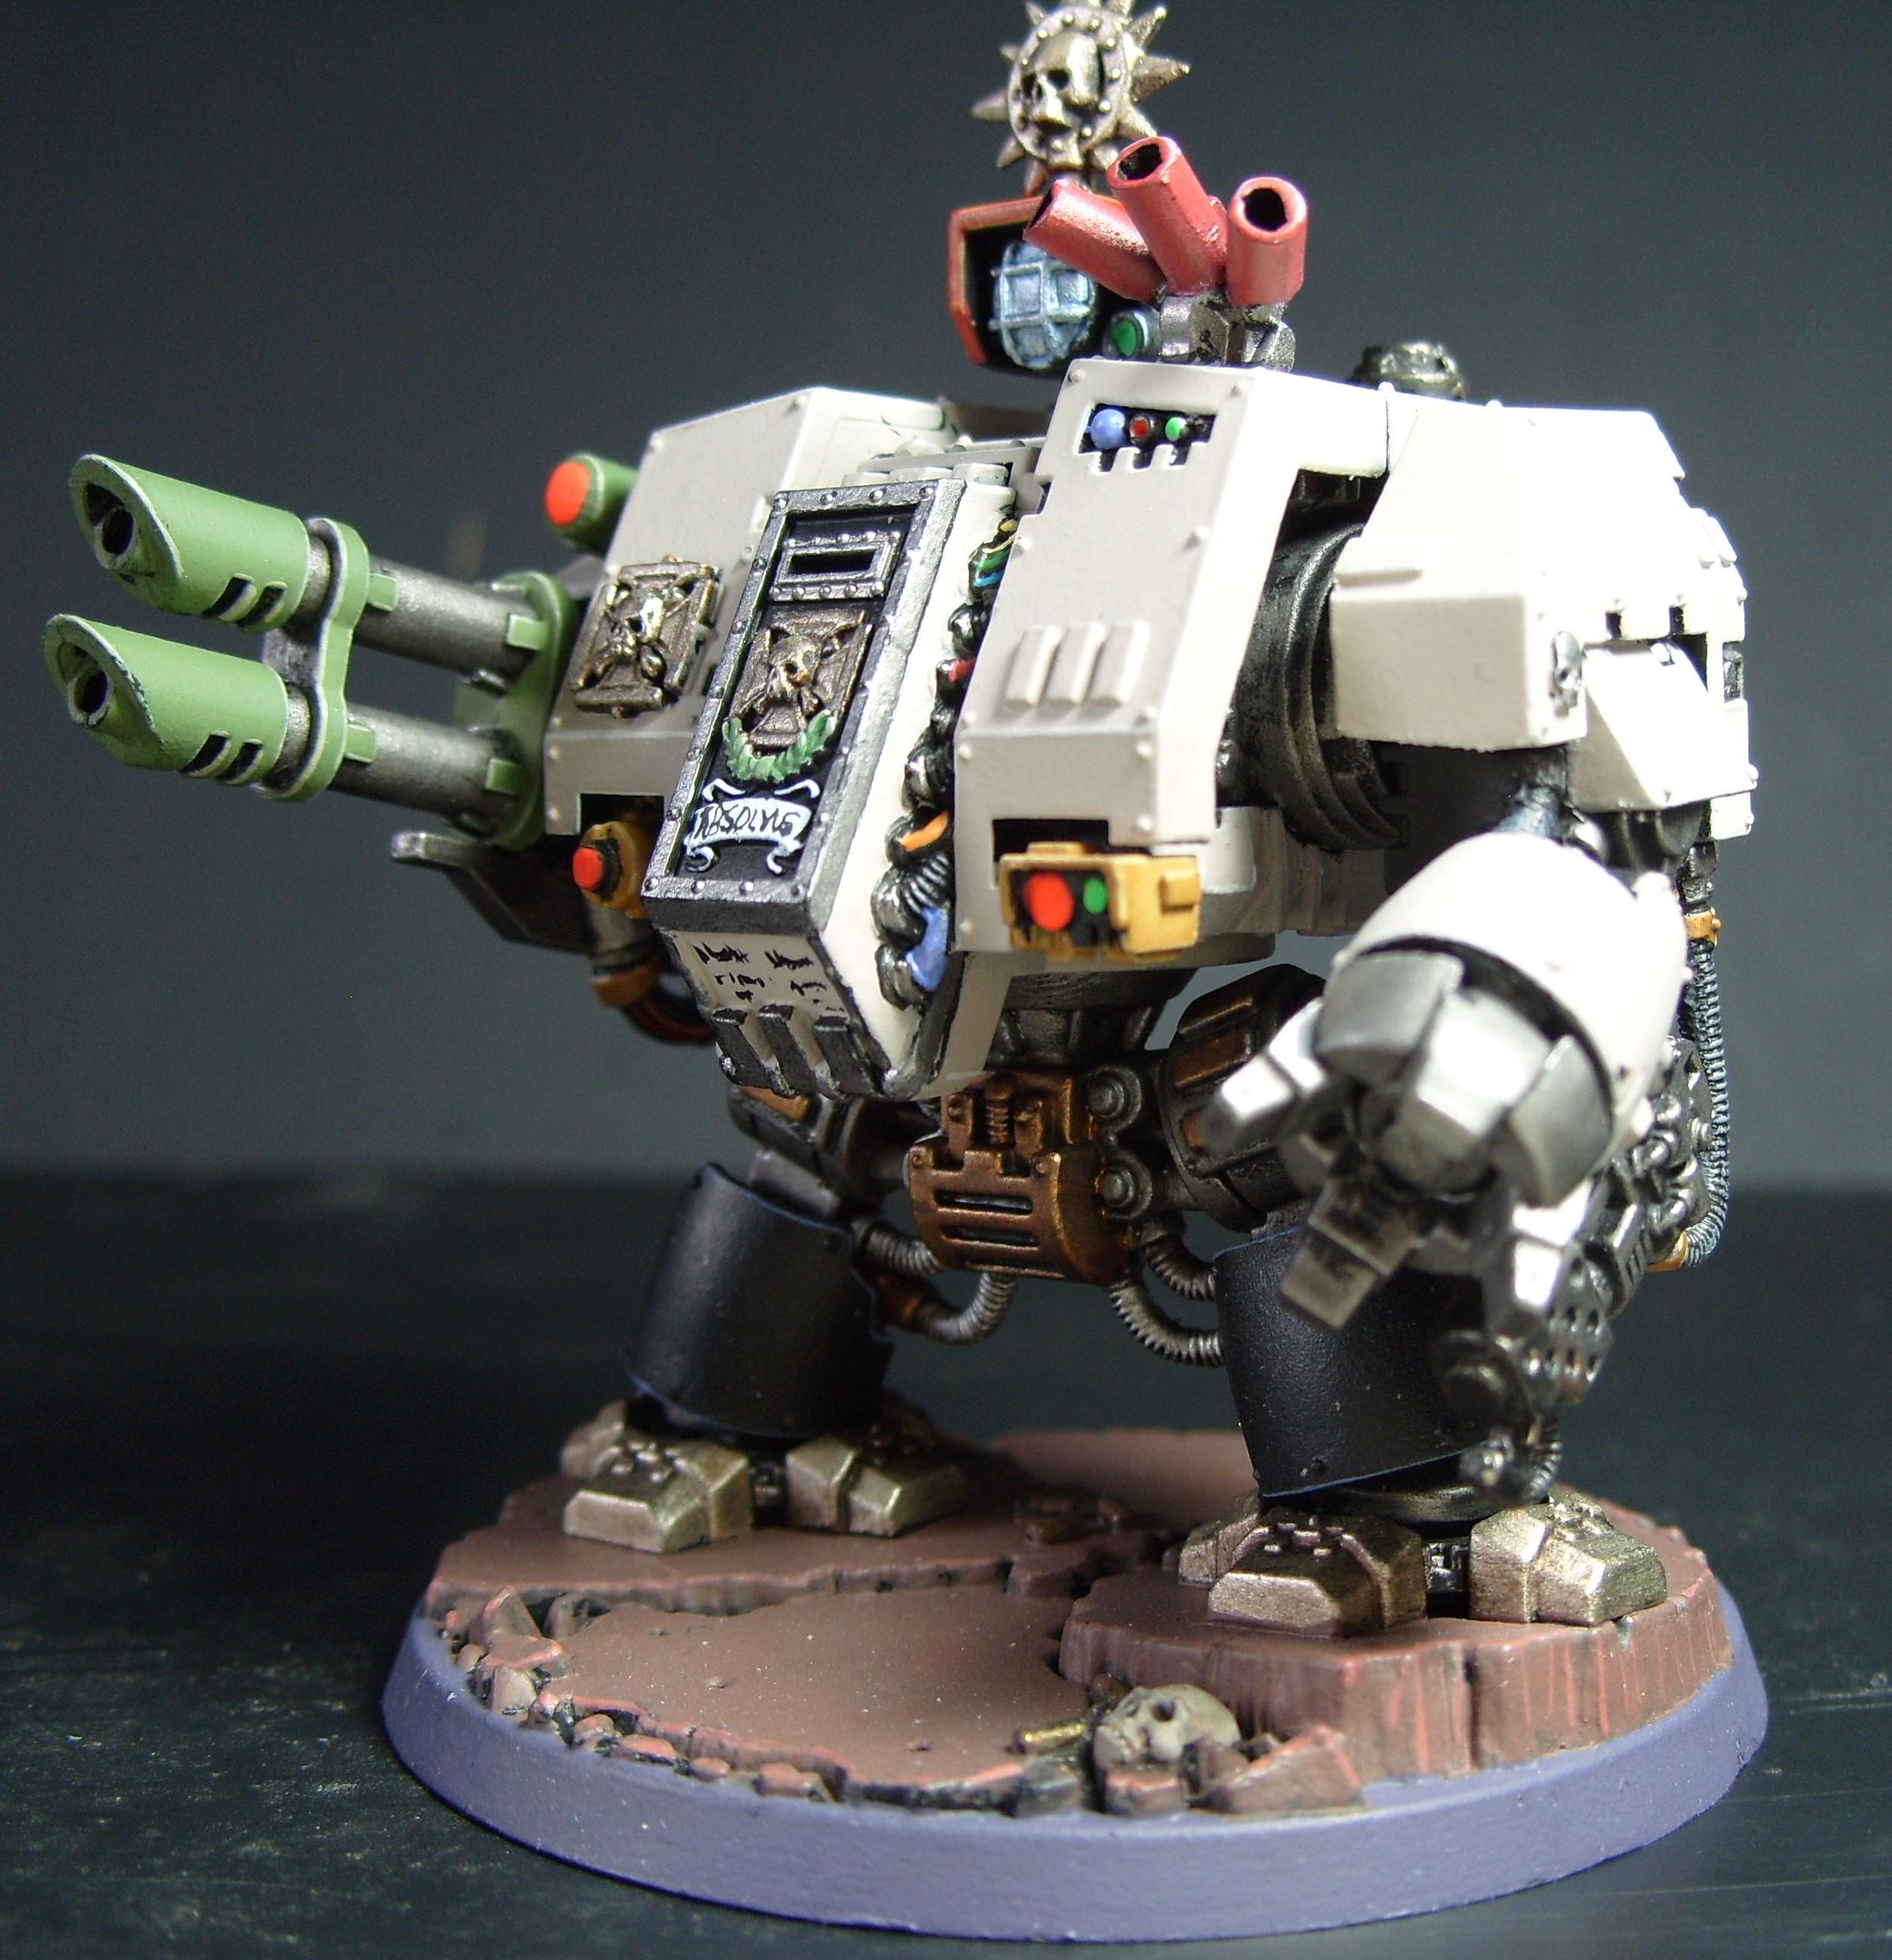 Adeptus Astartes, Dreadnought, Lascannon, Space Marines, Warhammer 40,000